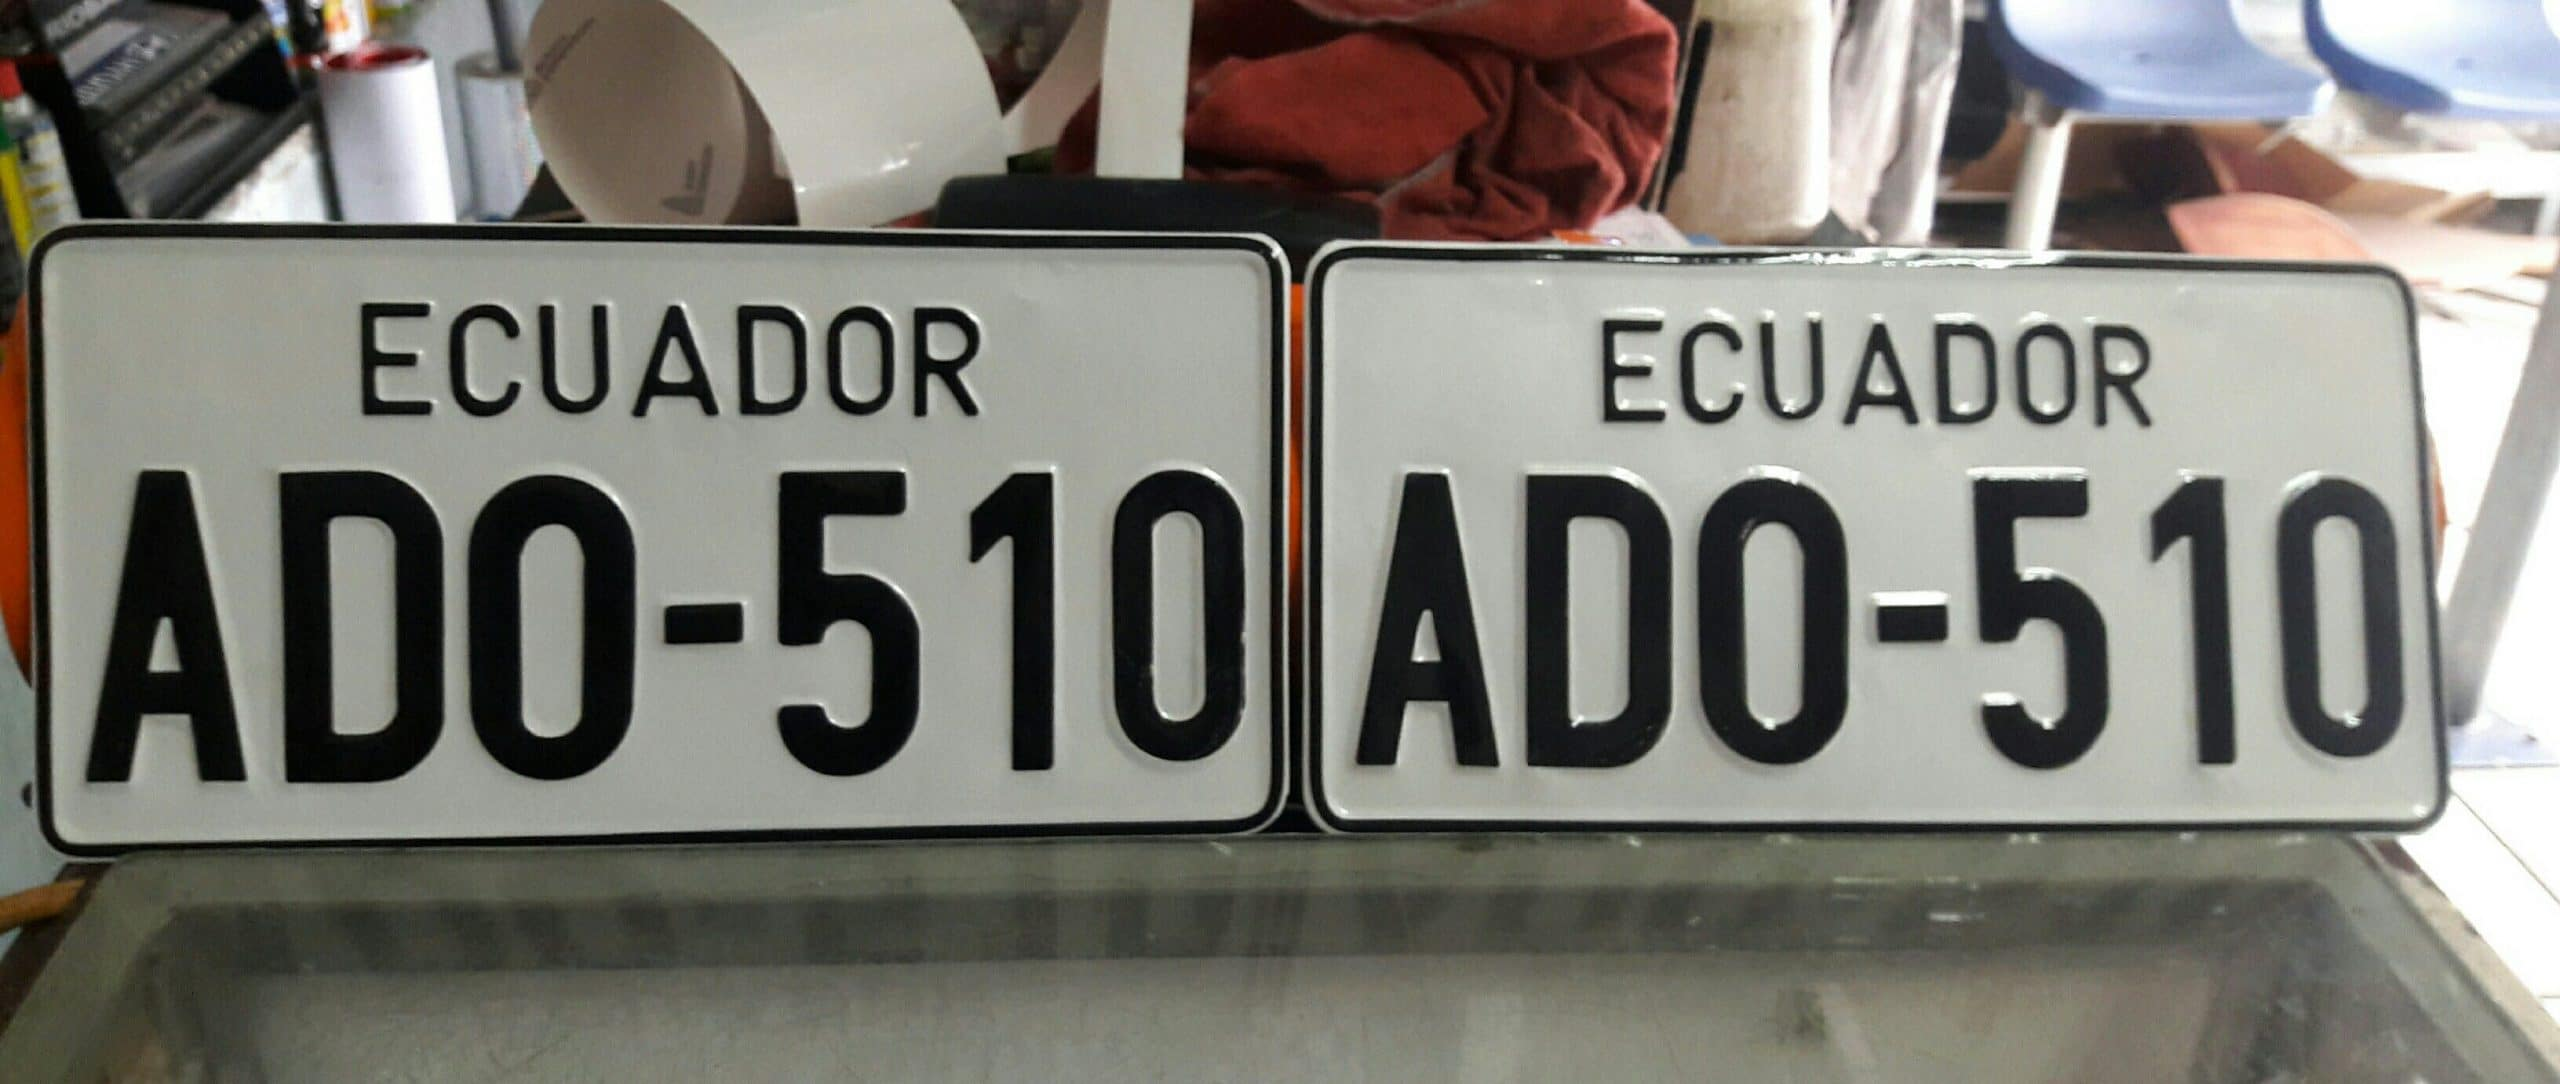 Nombre propietario matriculación vehicular